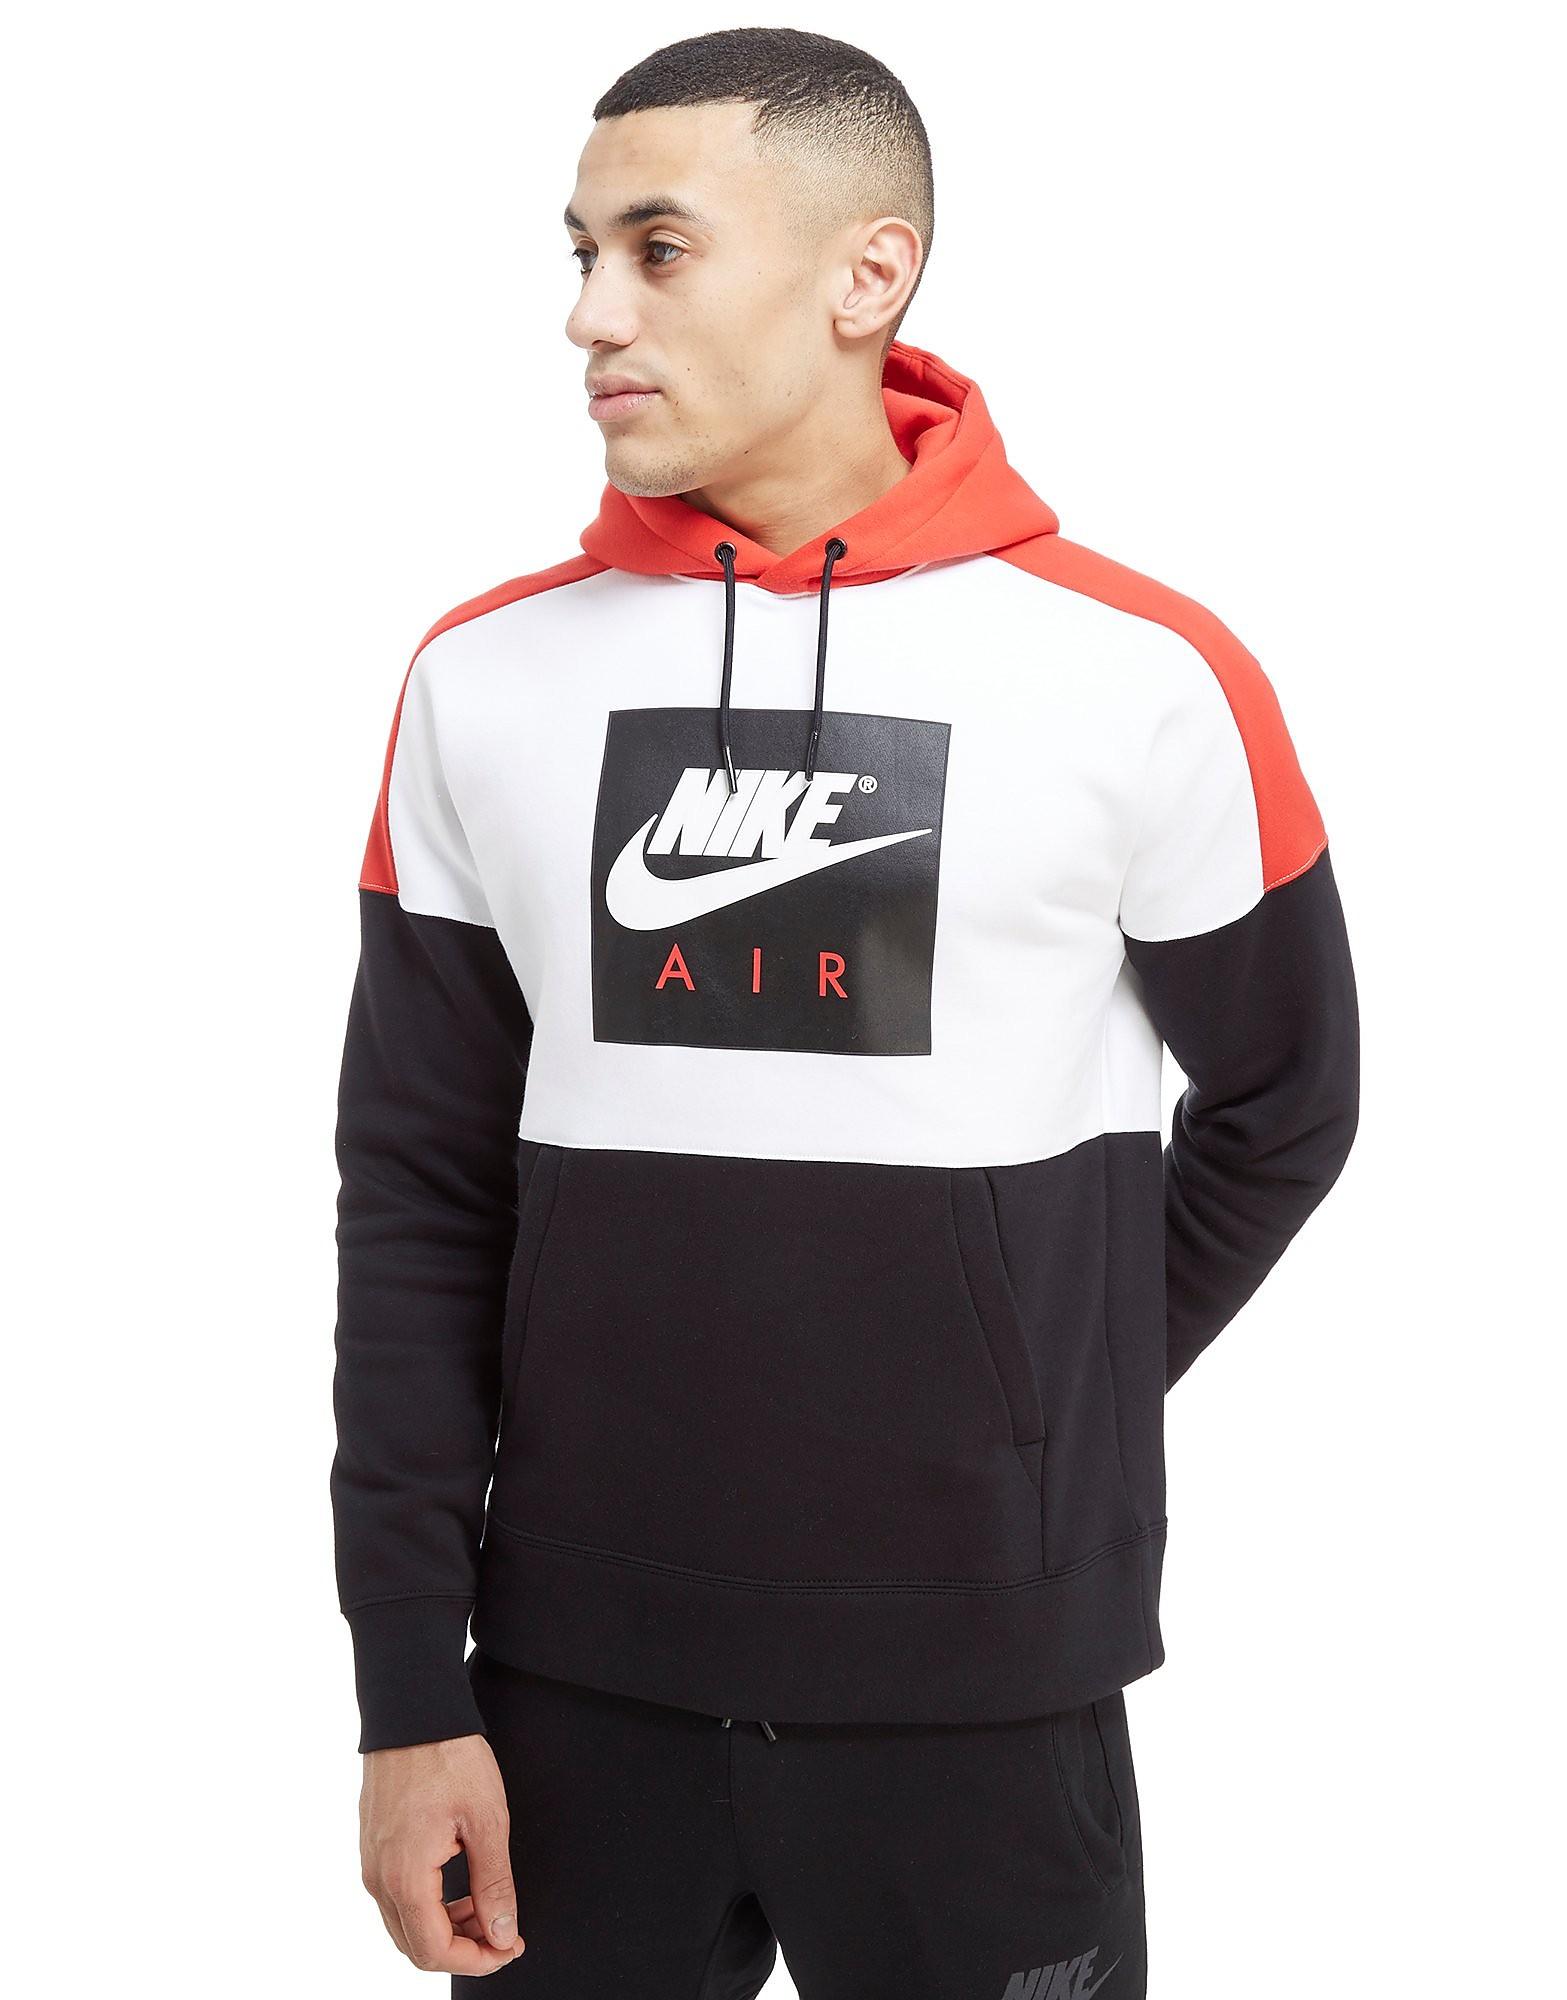 Nike Air Overhead Colourblock Hoodie Weiß-Rot/Schwarz